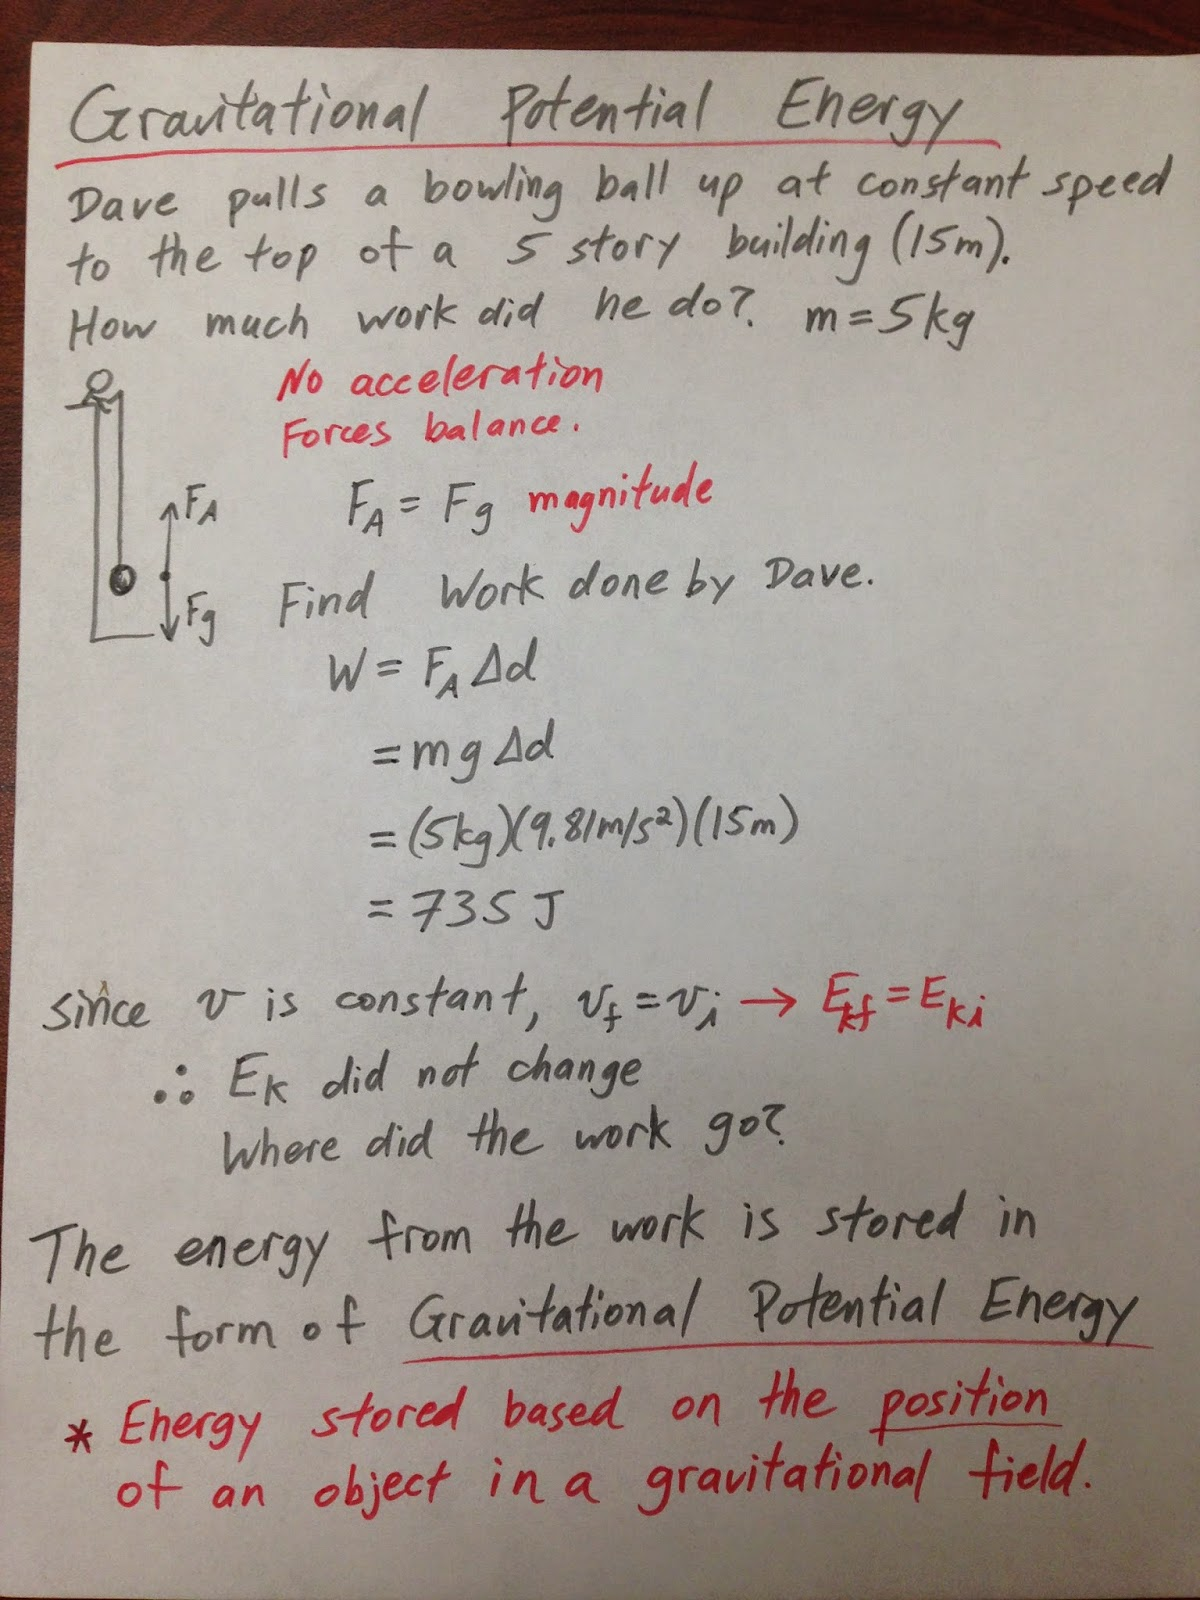 Grade 11 Physics Nov 6 Gravitational Potential Energy